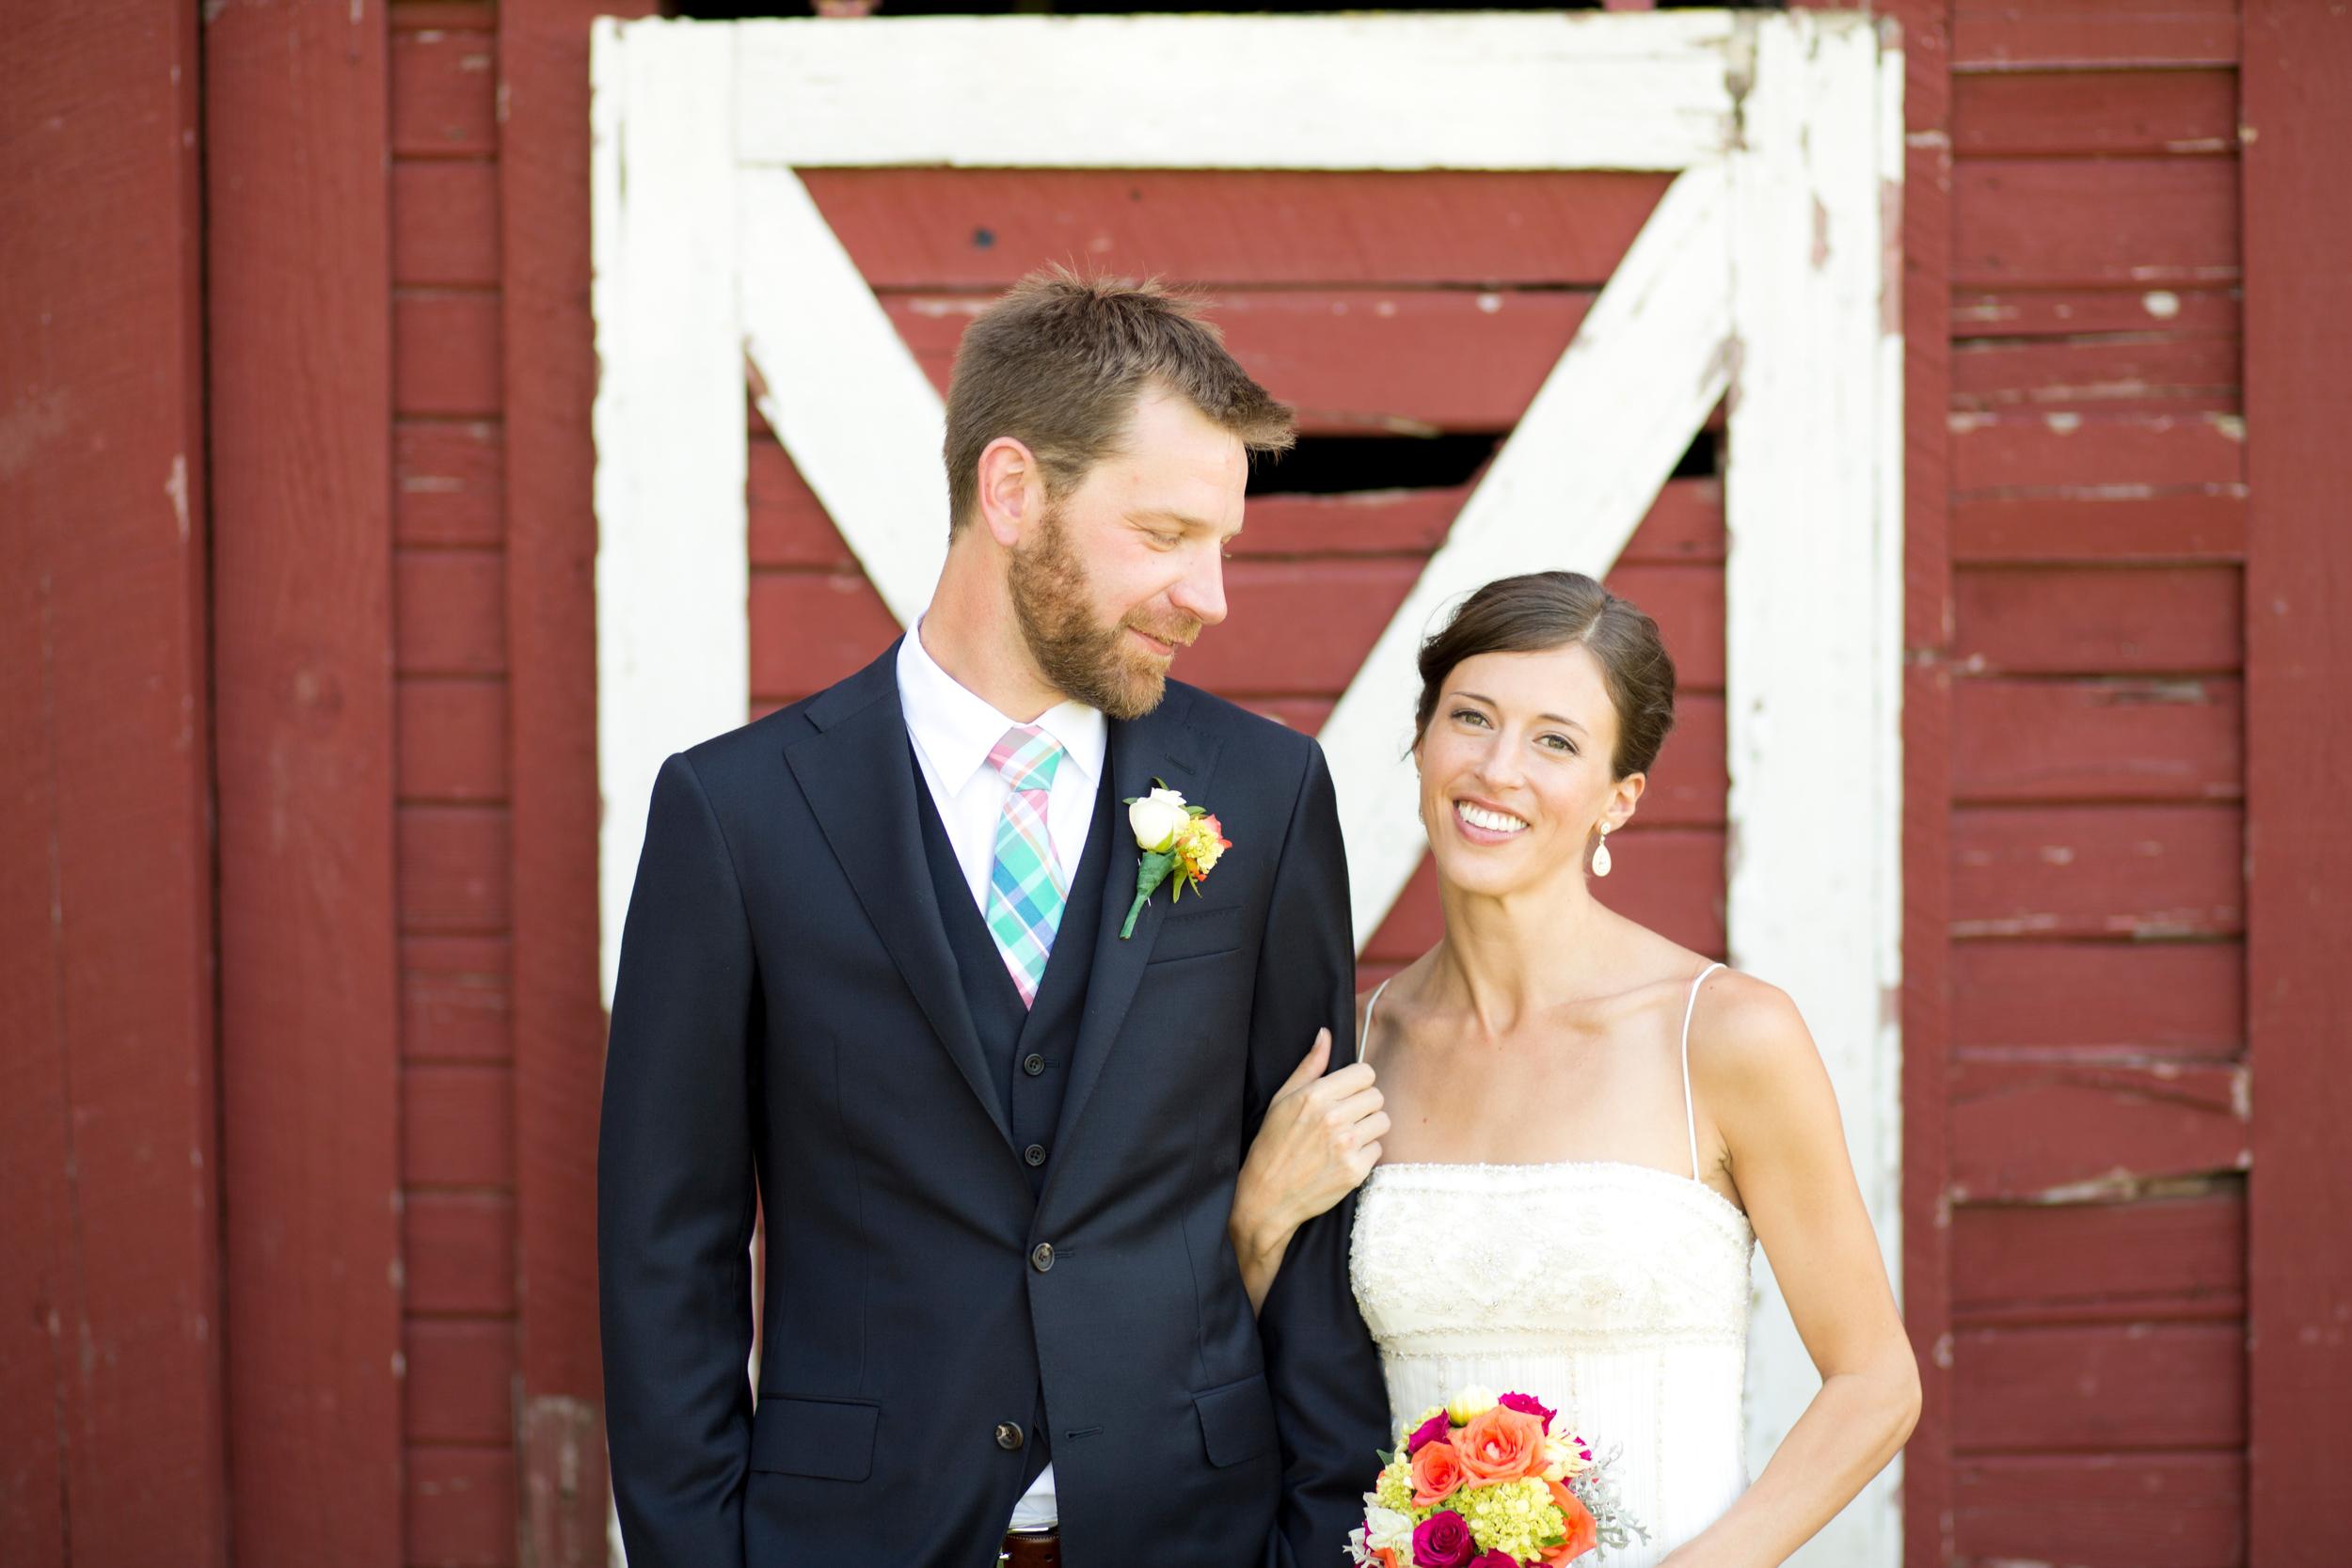 Bridalbliss.com | Portland Wedding | Oregon Event Planning and Design | Stephanie Klein Photography